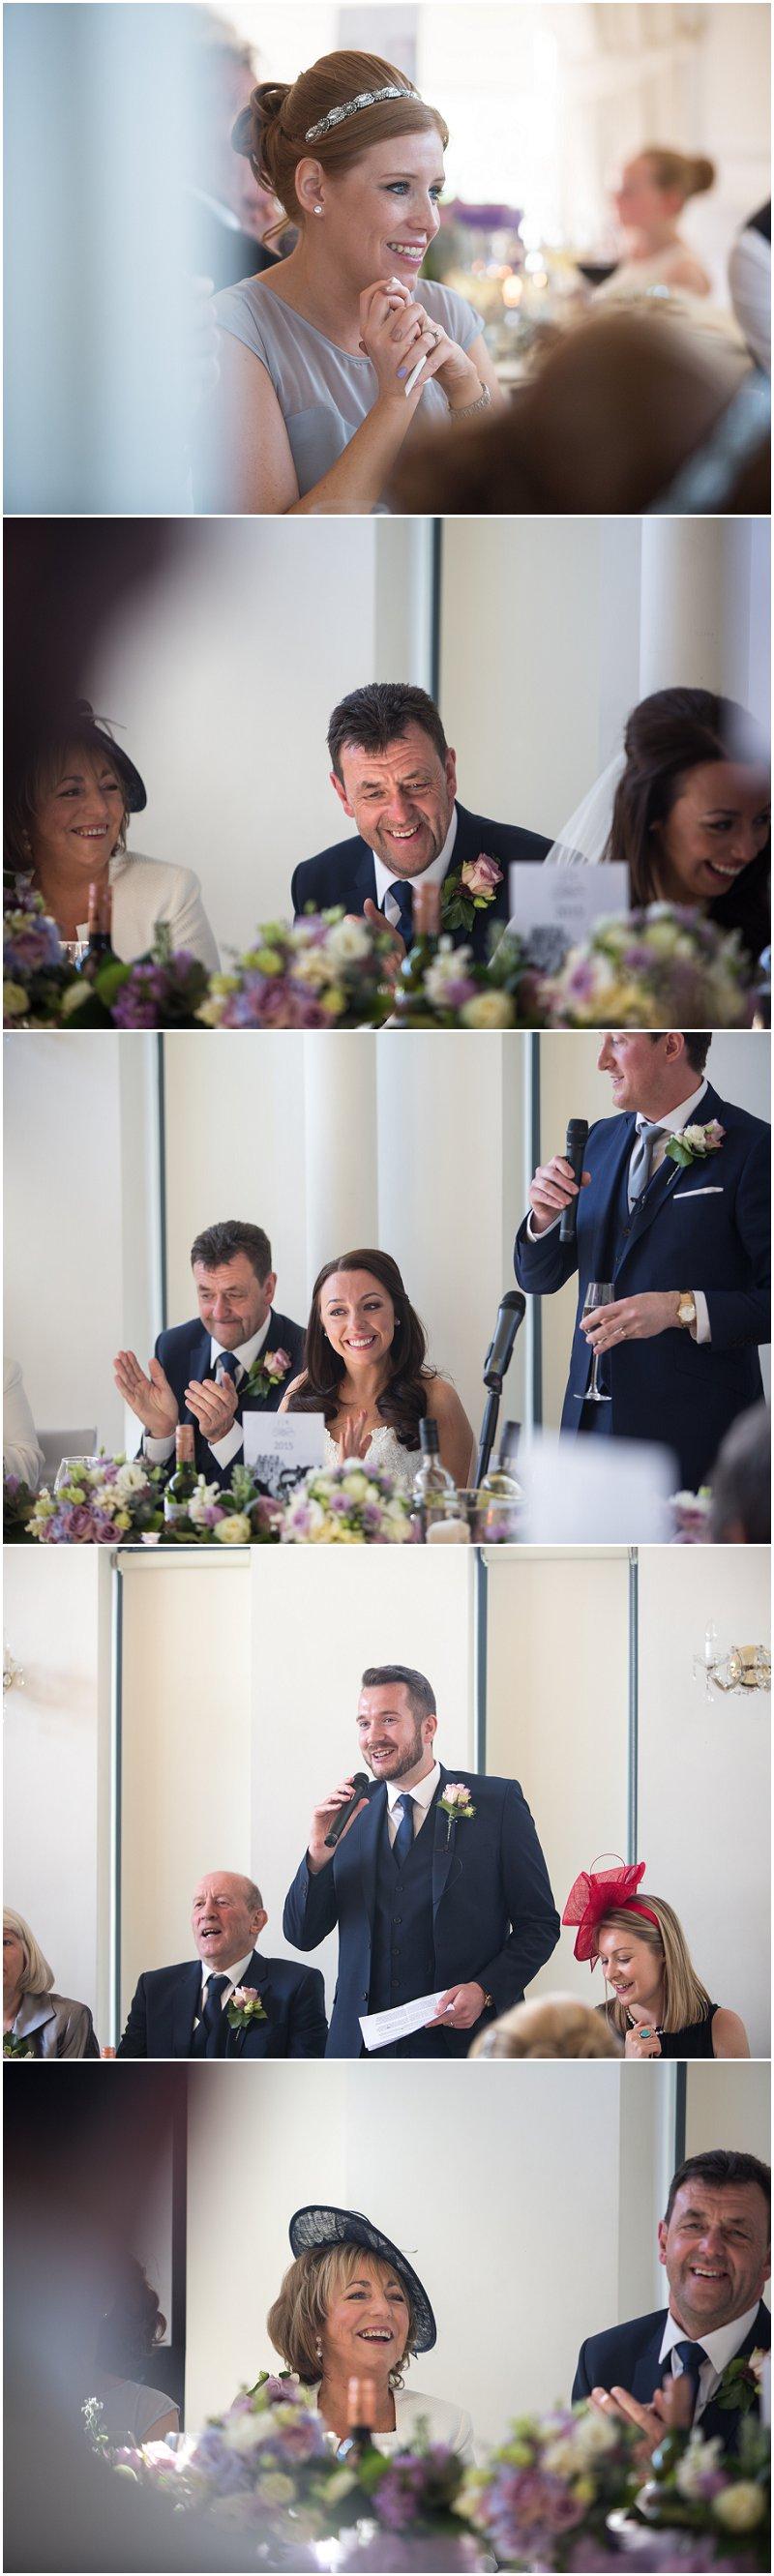 Speeches at West Tower Wedding